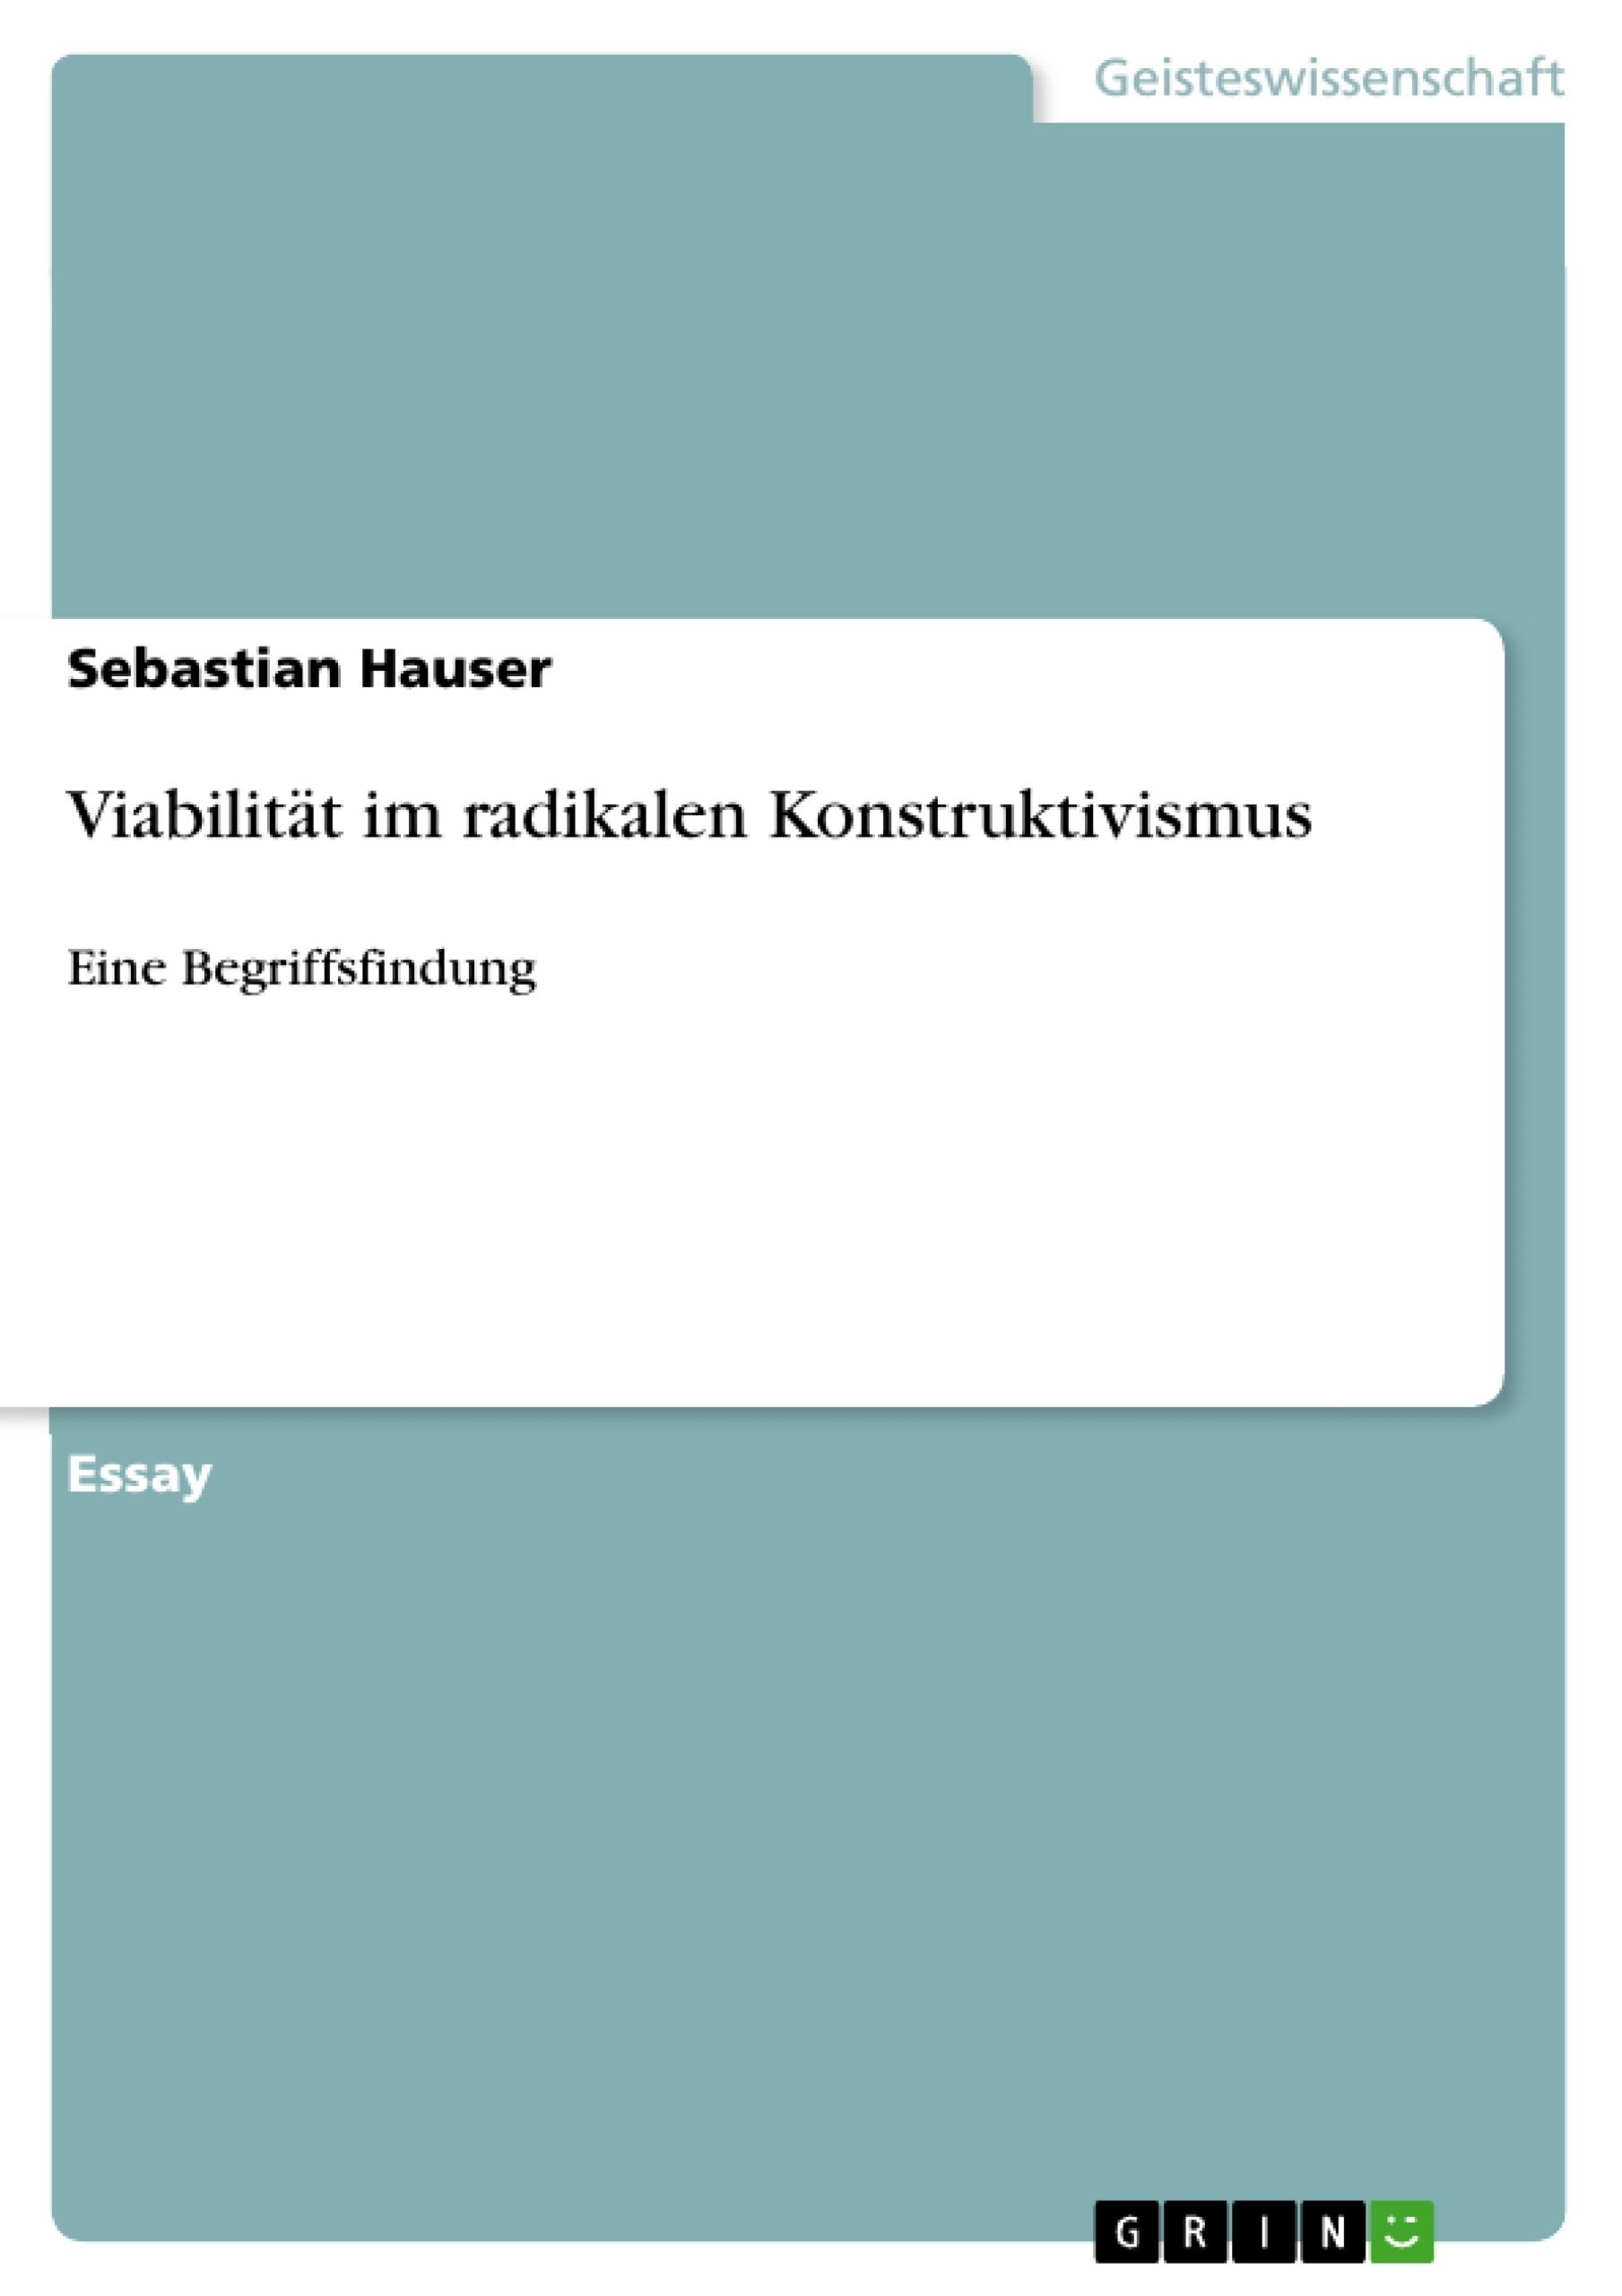 Titel: Viabilität im radikalen Konstruktivismus